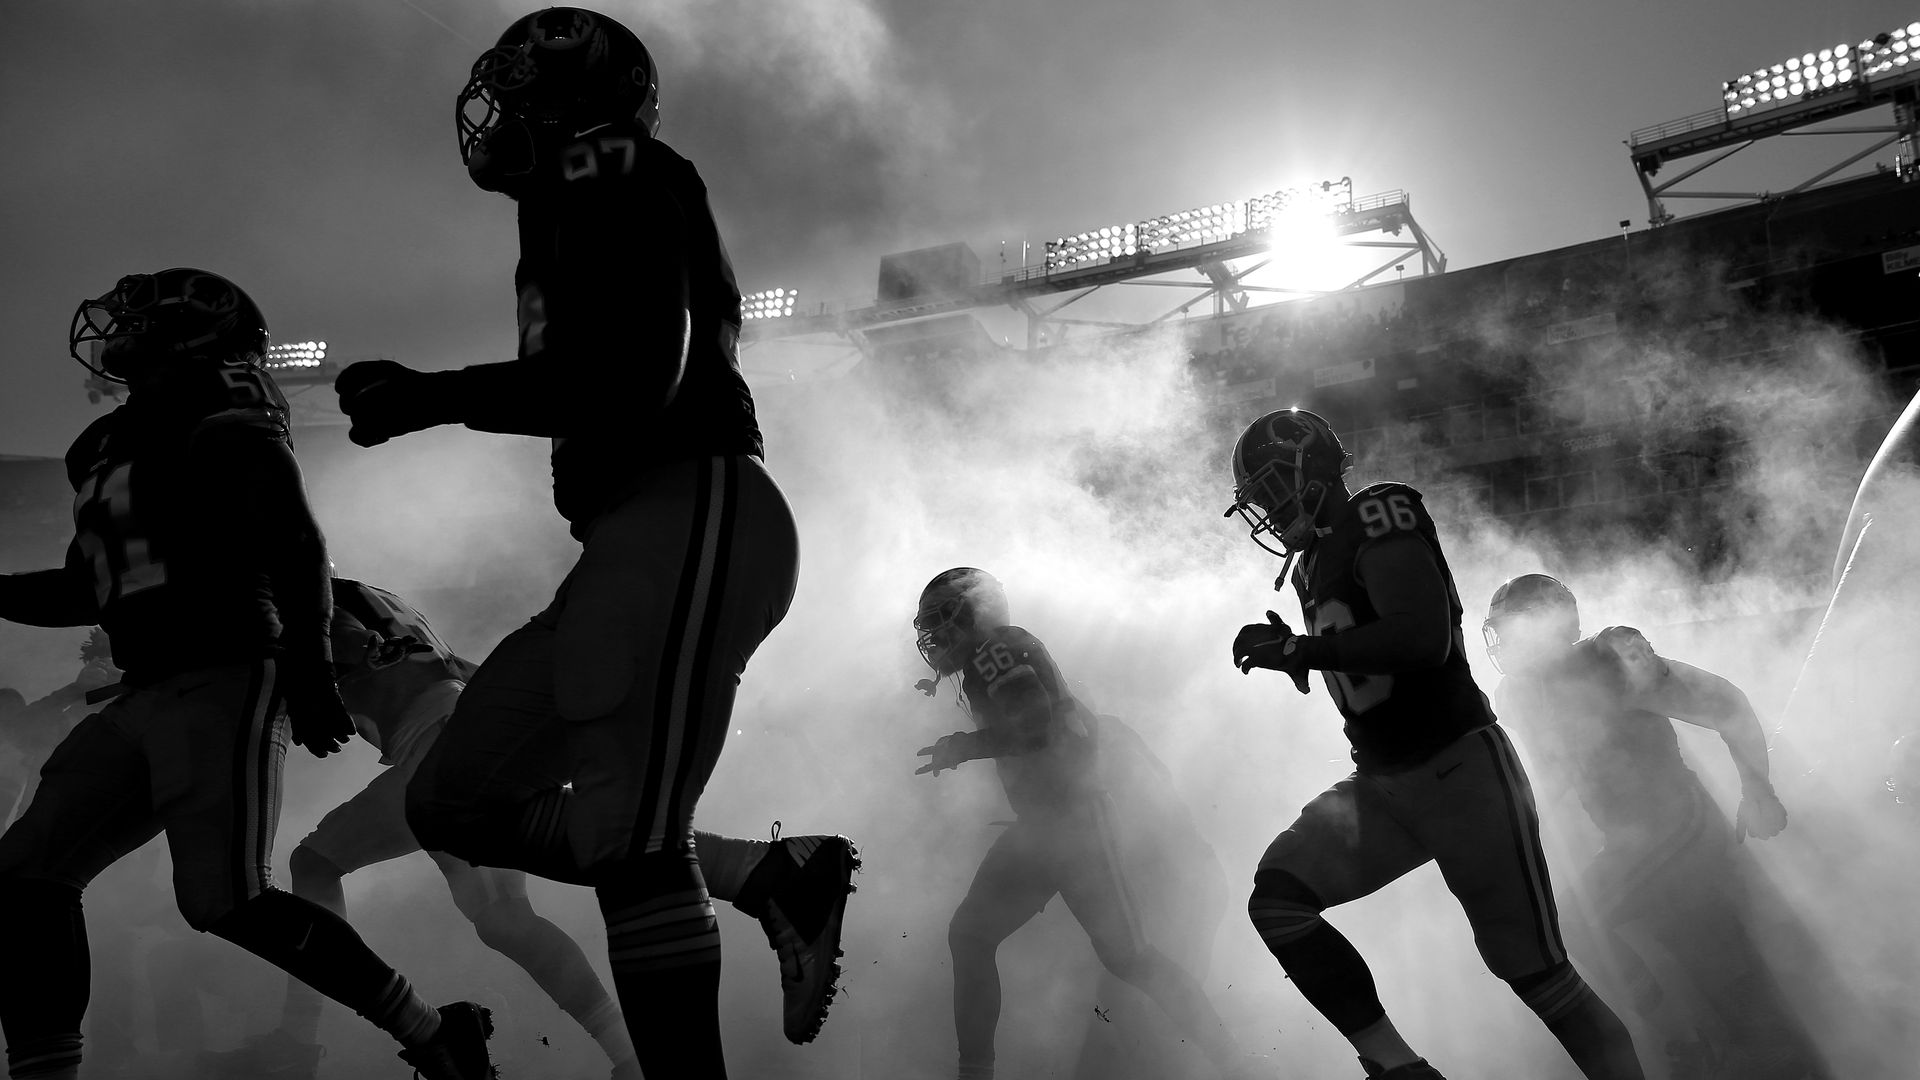 A black and white image: Washington football players run onto the field through a haze of fog.